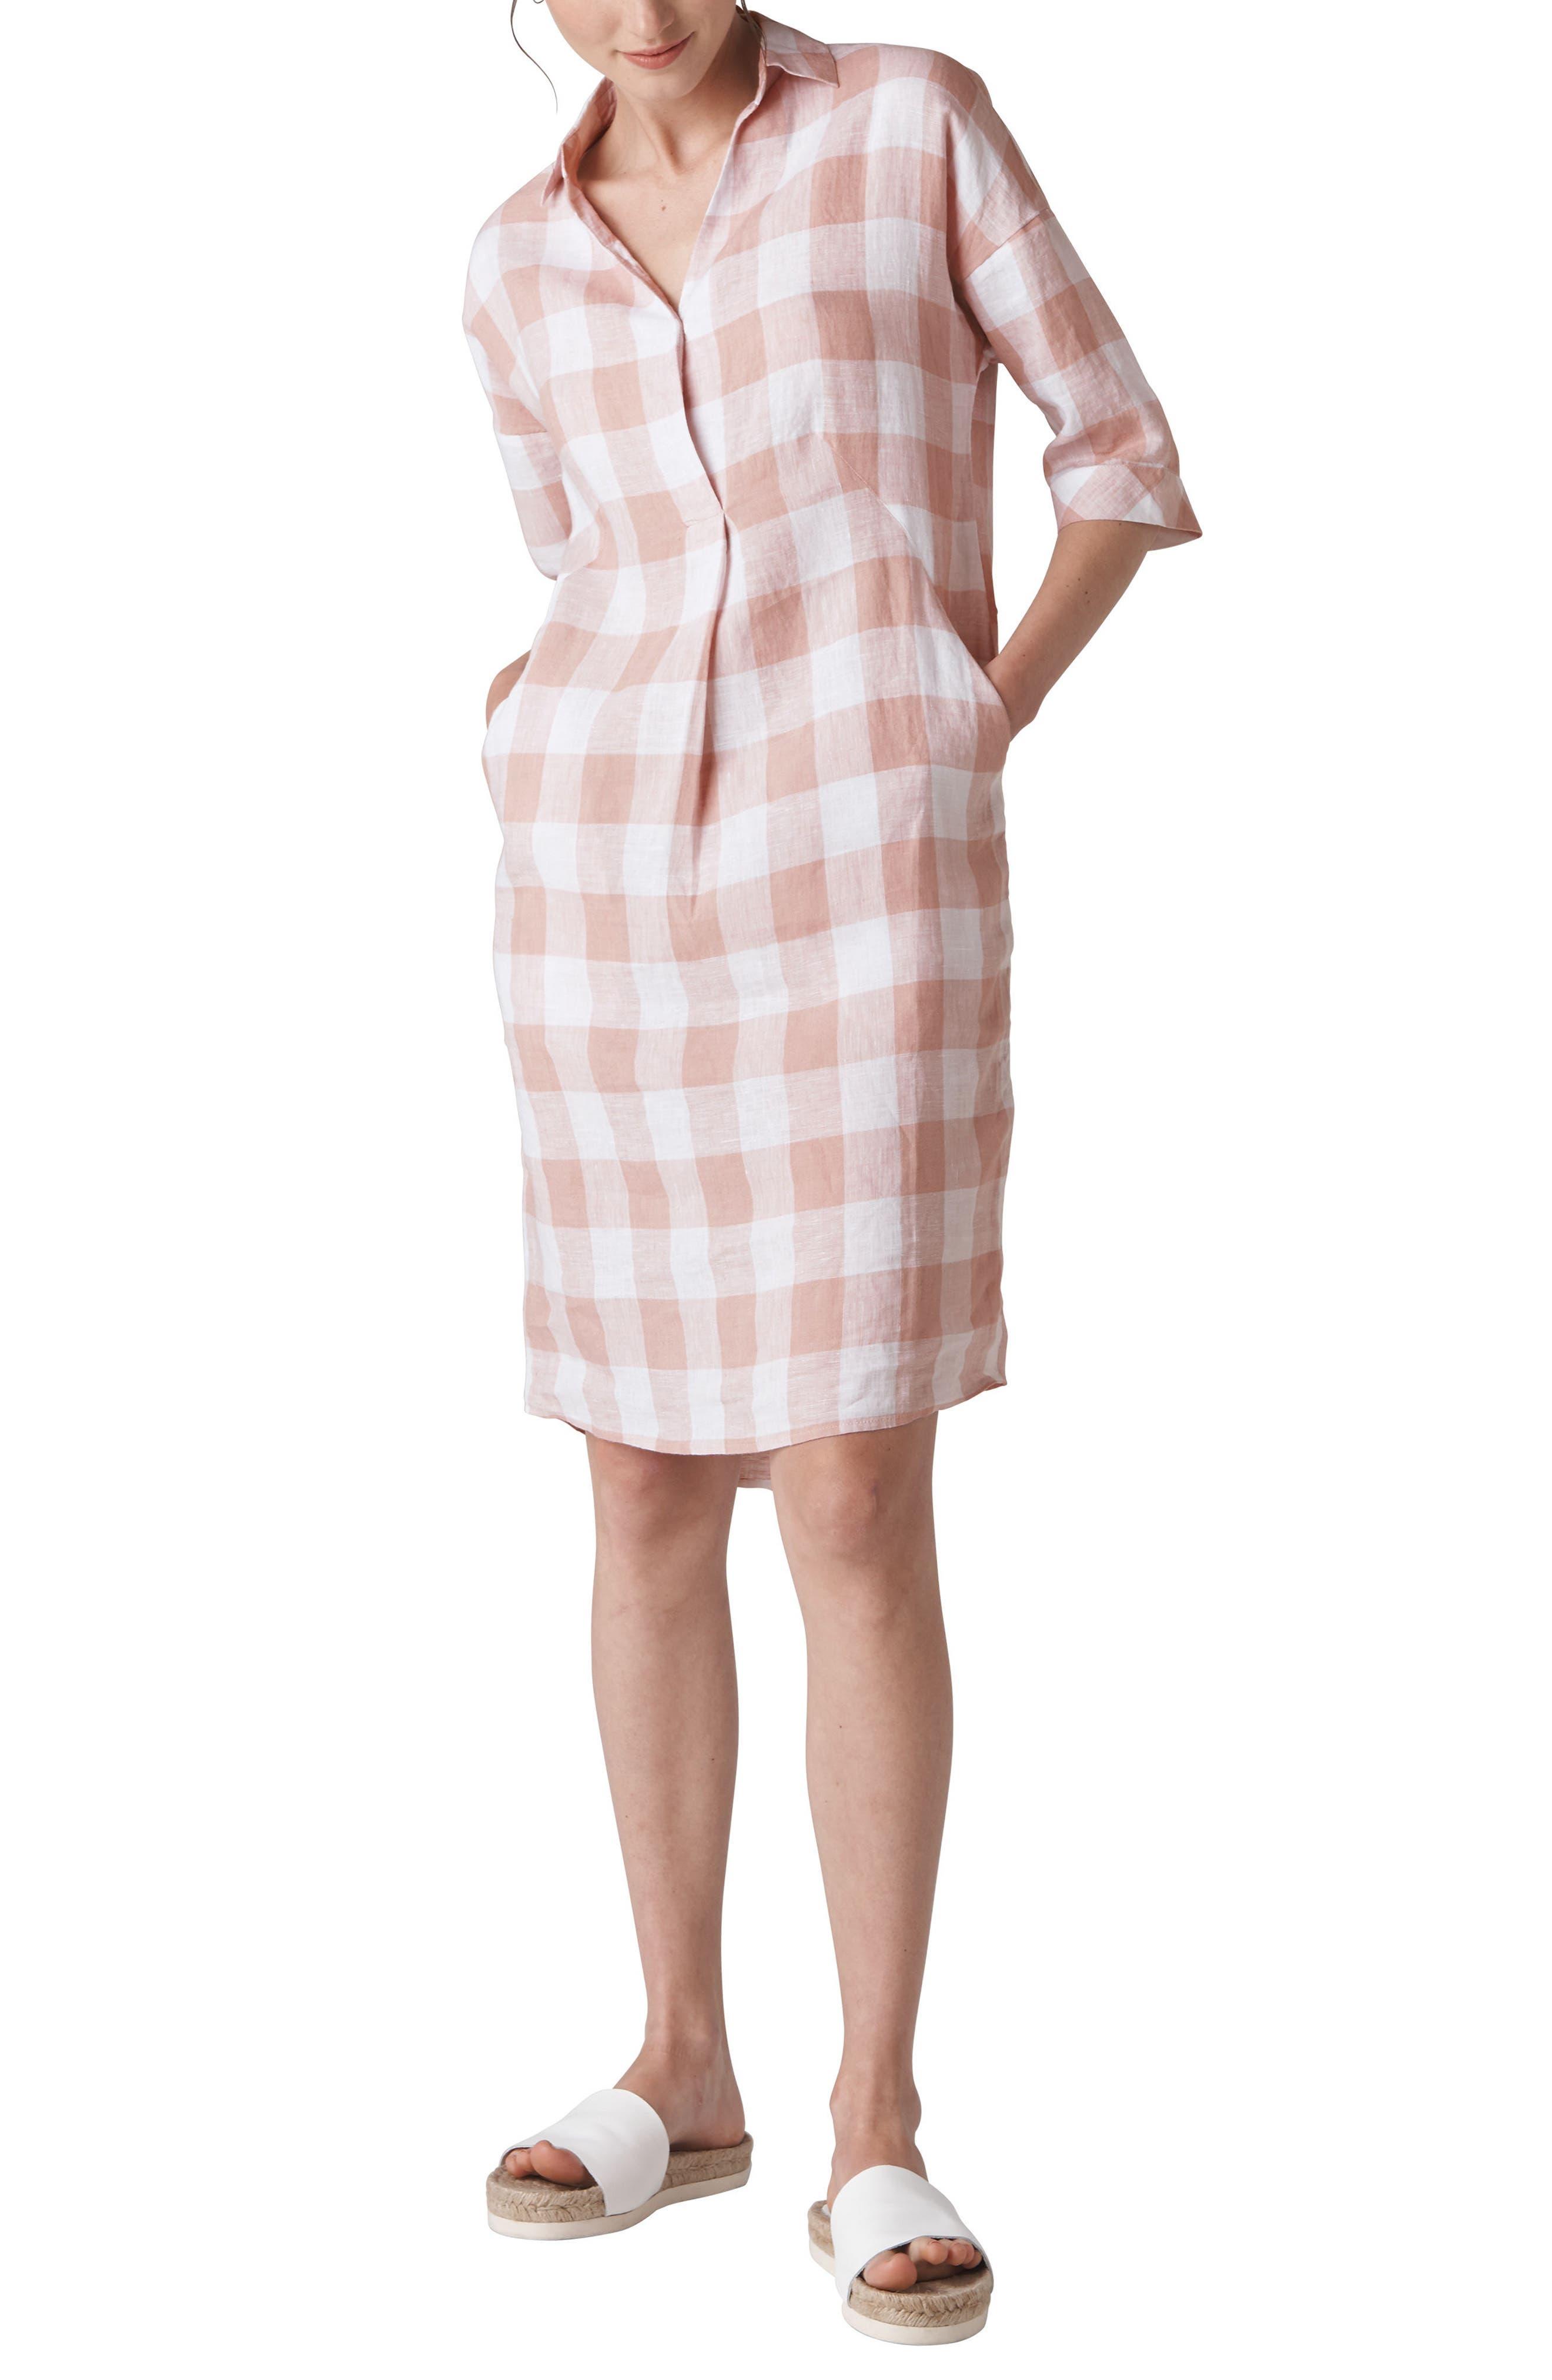 Lola Gingham Dress,                         Main,                         color, MULTI COLOR